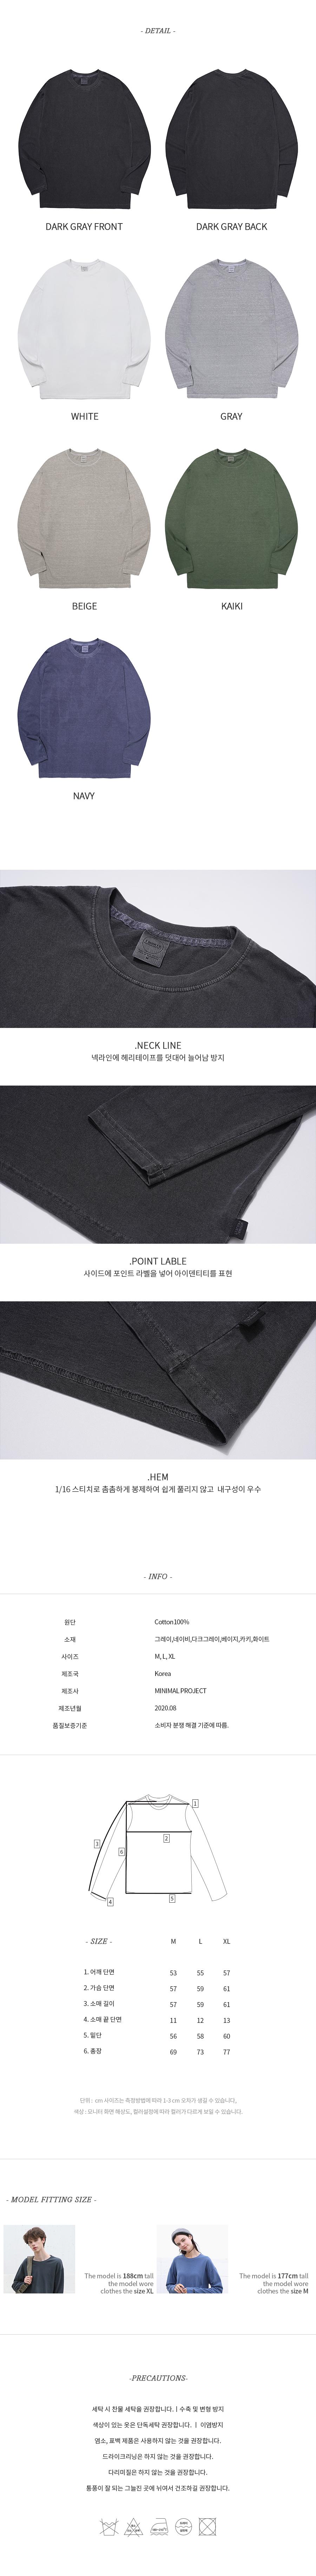 [minimal project] 미니멀프로젝트 피그먼트 워시드 오버핏 롱 슬리브 티셔츠 MLT105 [DARKNAVY]